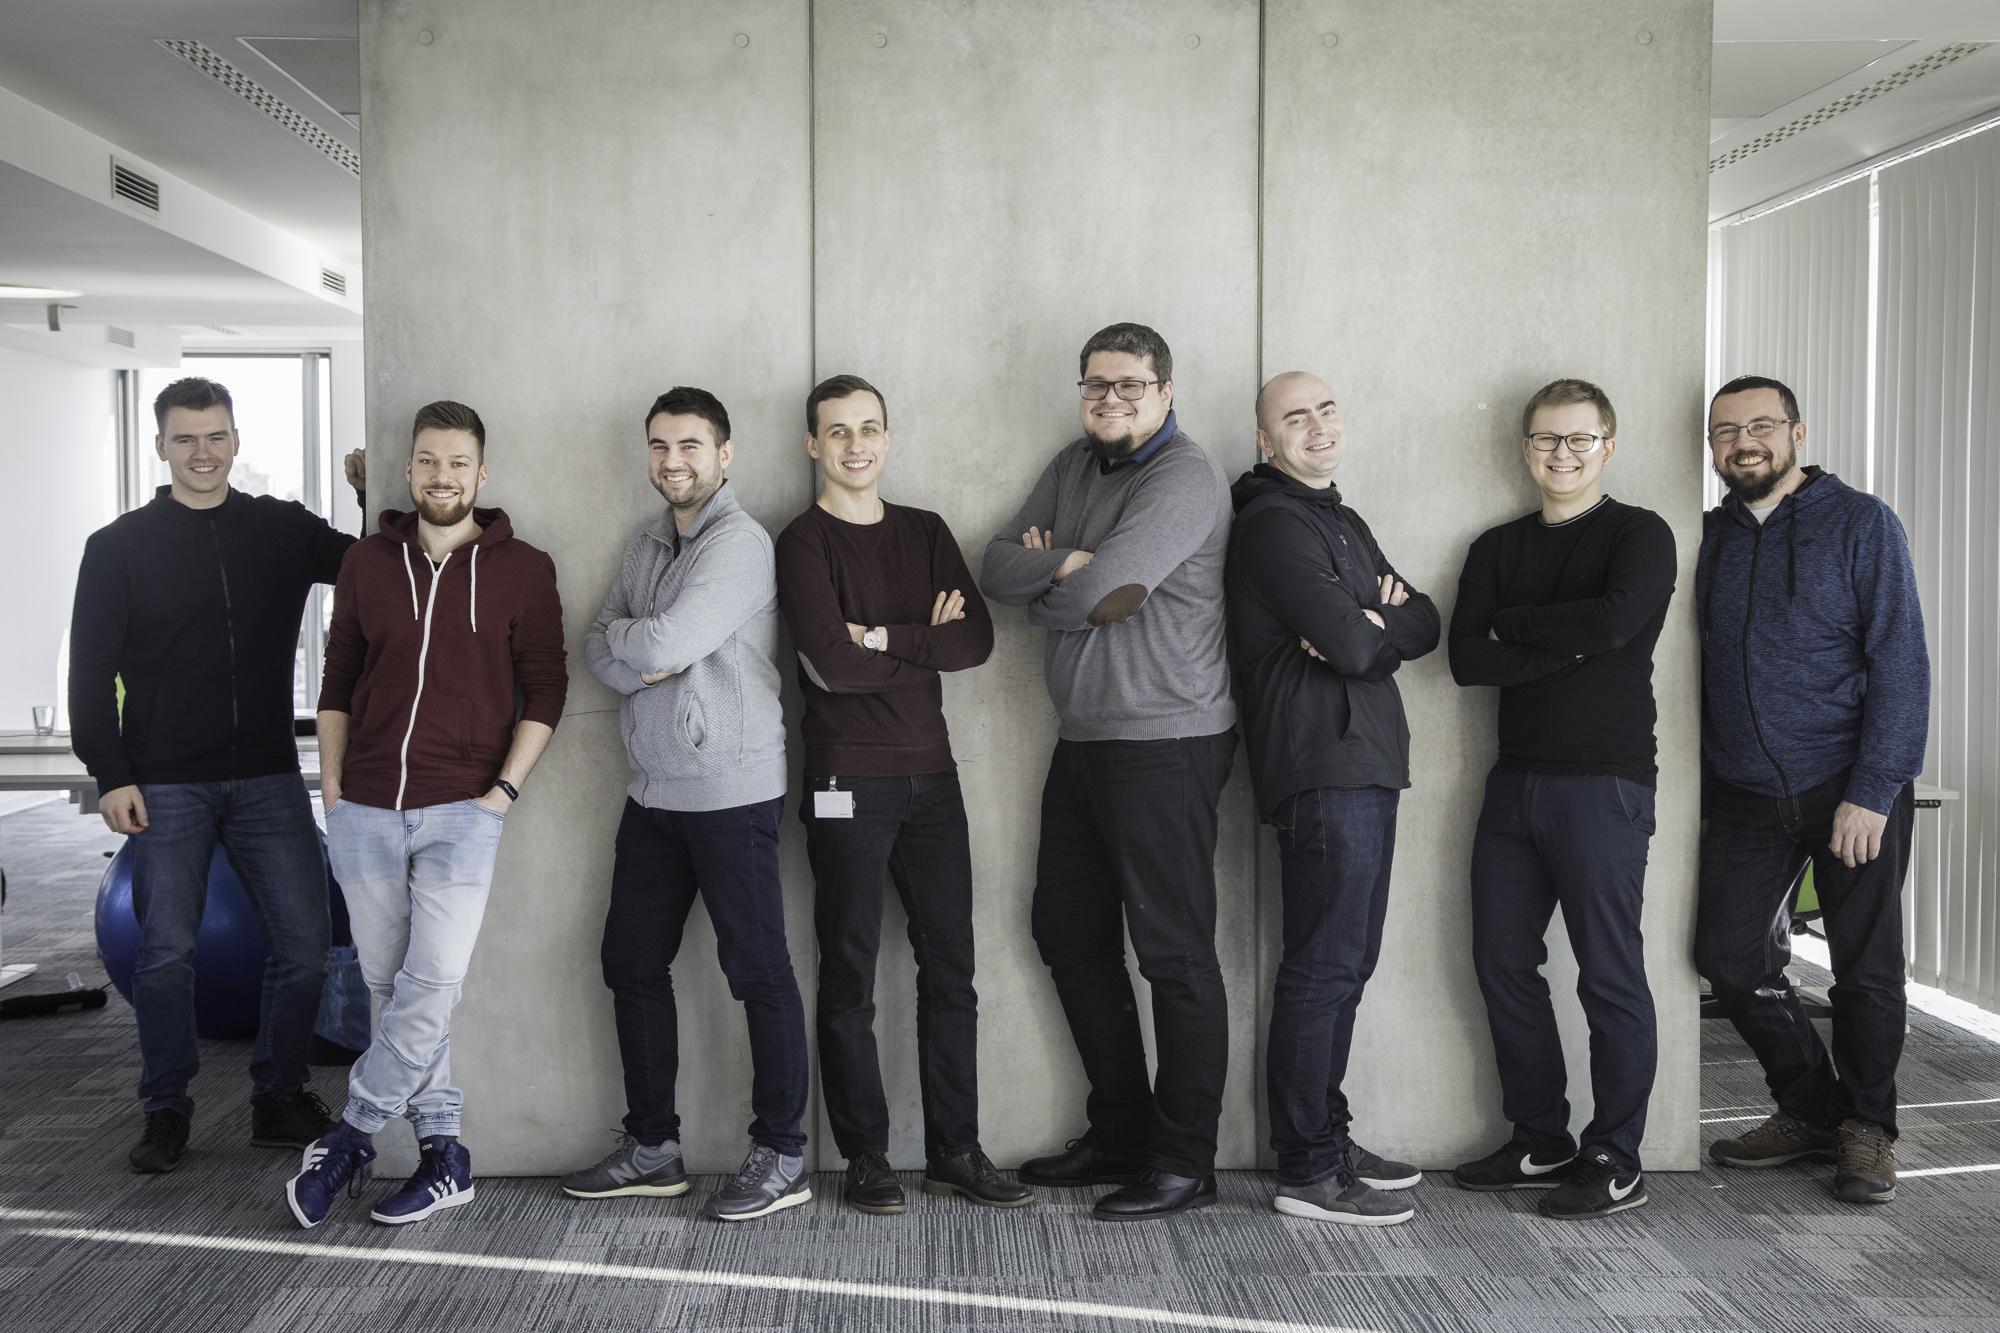 The Krakow part of the Rose and Vantage teams. From left: Jacek Zawodny -> Michał Zydroń -> Kamil Lis -> Kamil Gruszowski -> Mateusz Janik -> Me -> Dawid Smoter -> Sebastian Maliszczak